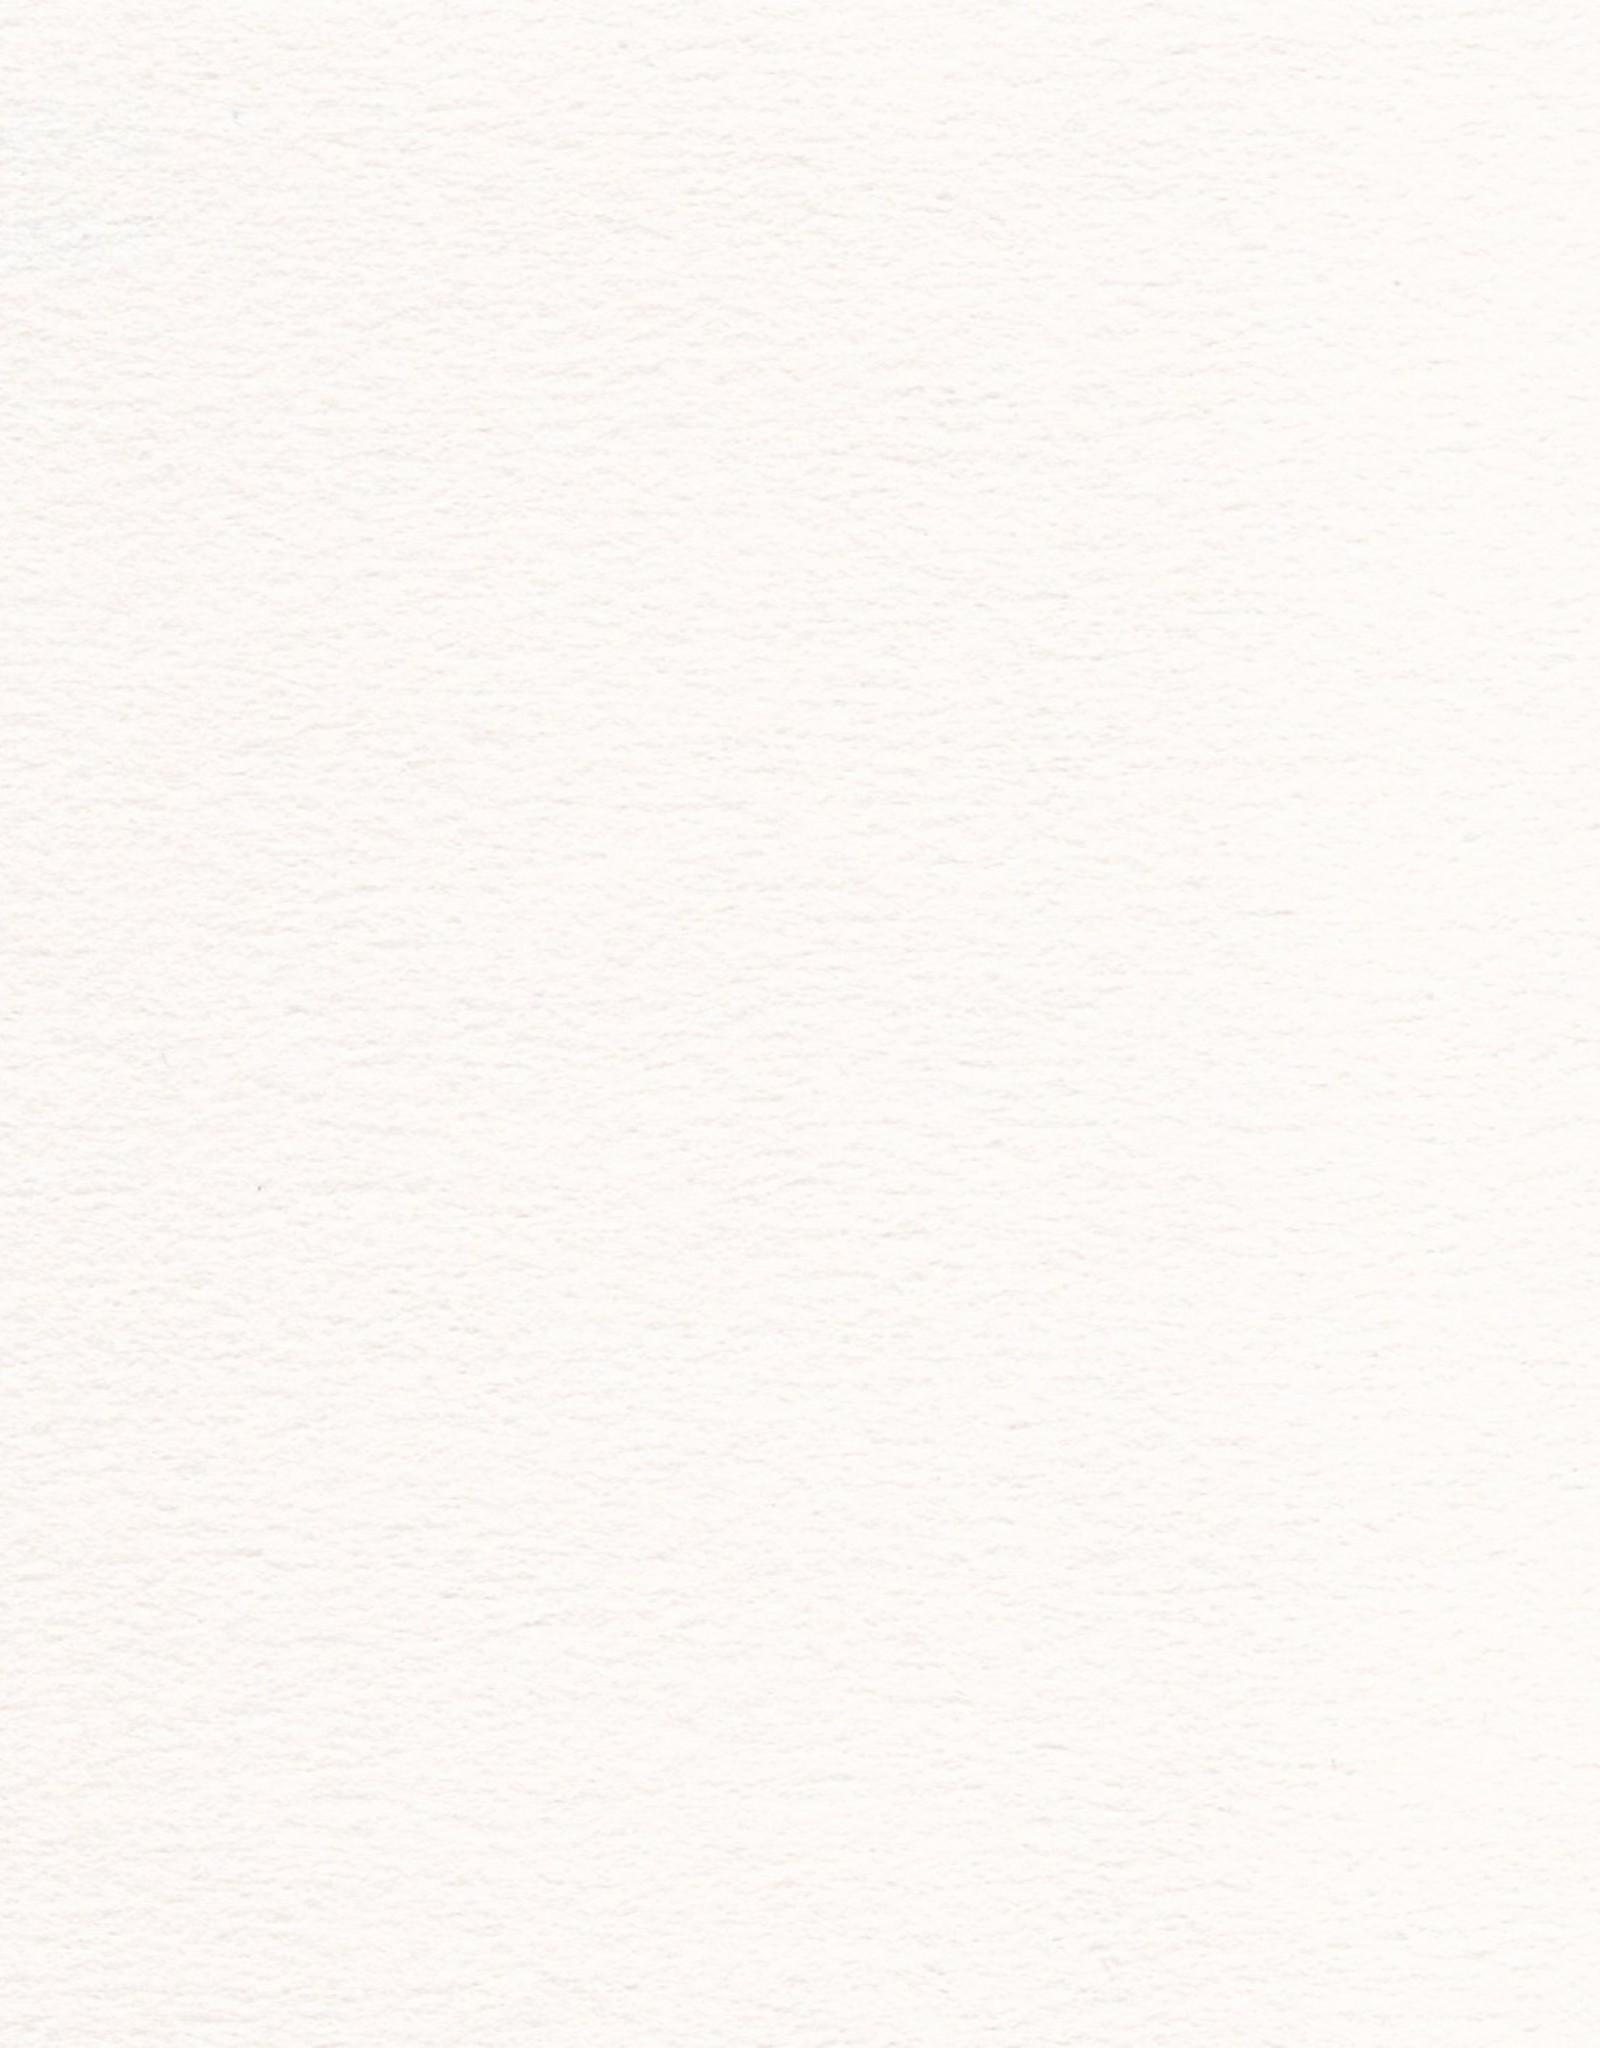 "Colorplan, 91#, Text, Vellum White, 25"" x 38"", 135 gsm"